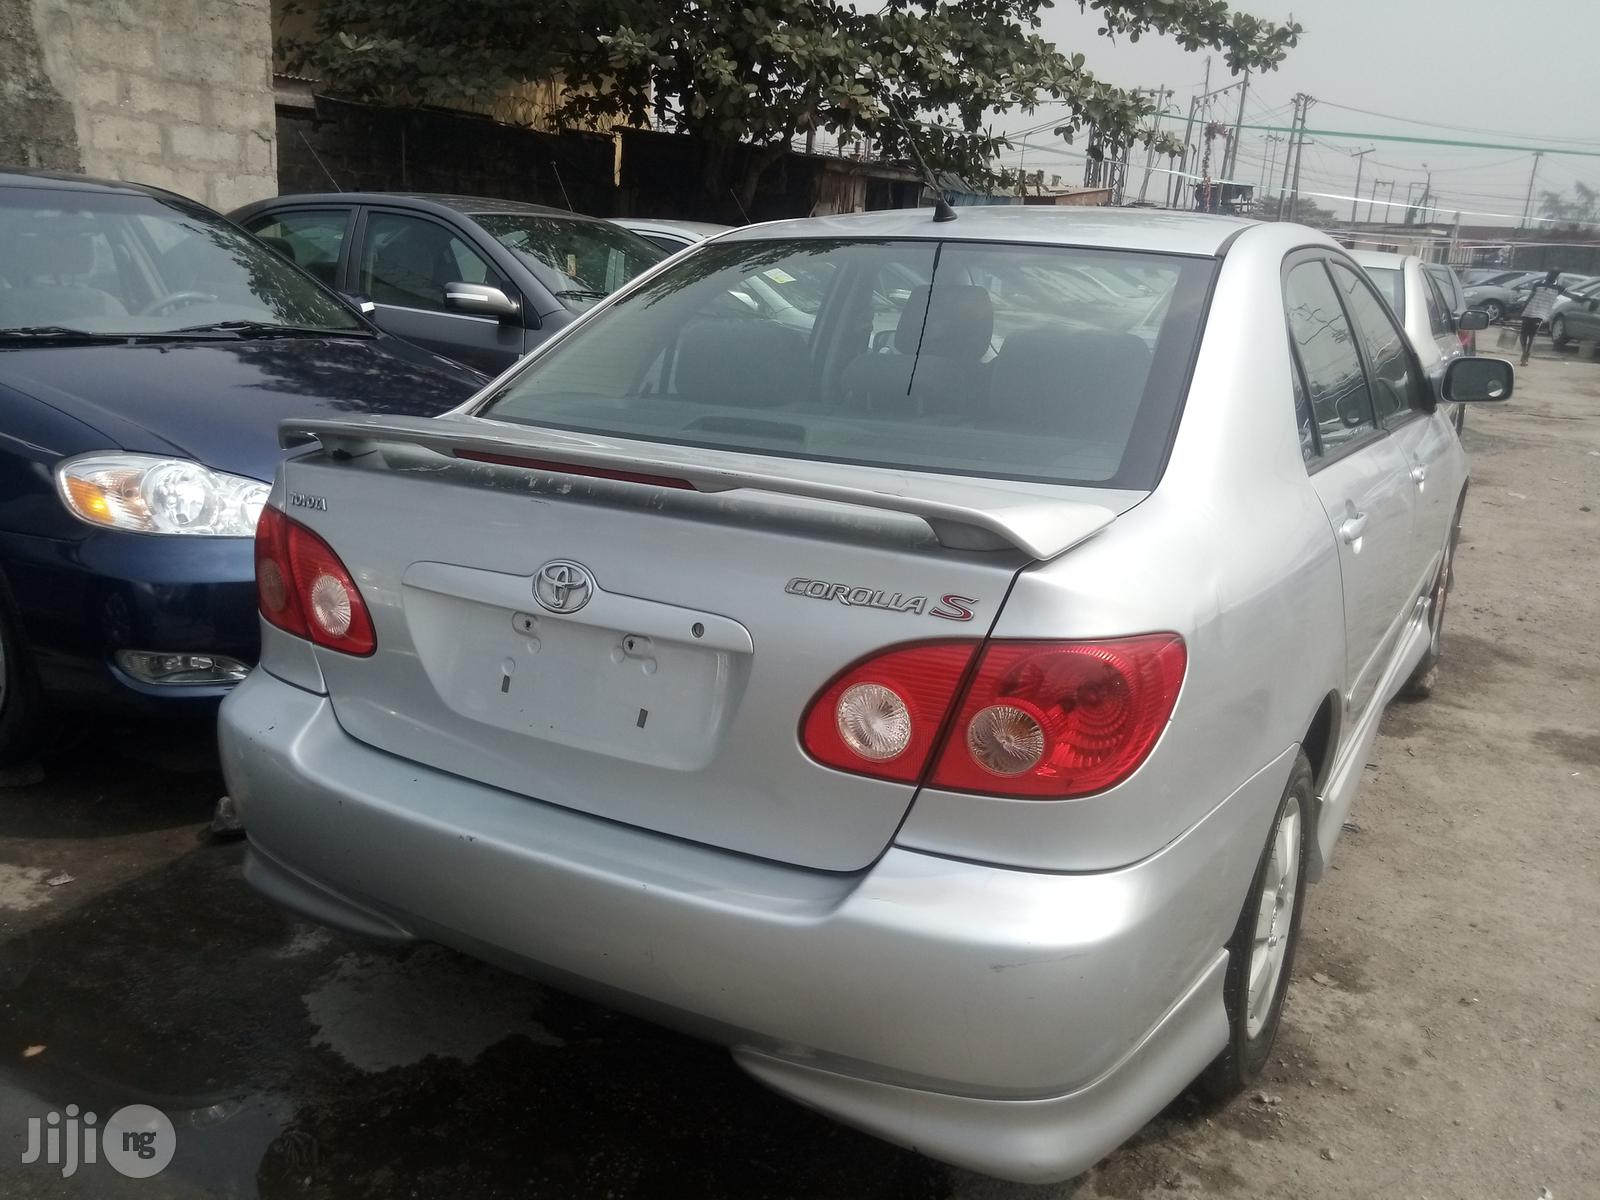 Toyota Corolla 2006 S Silver | Cars for sale in Apapa, Lagos State, Nigeria